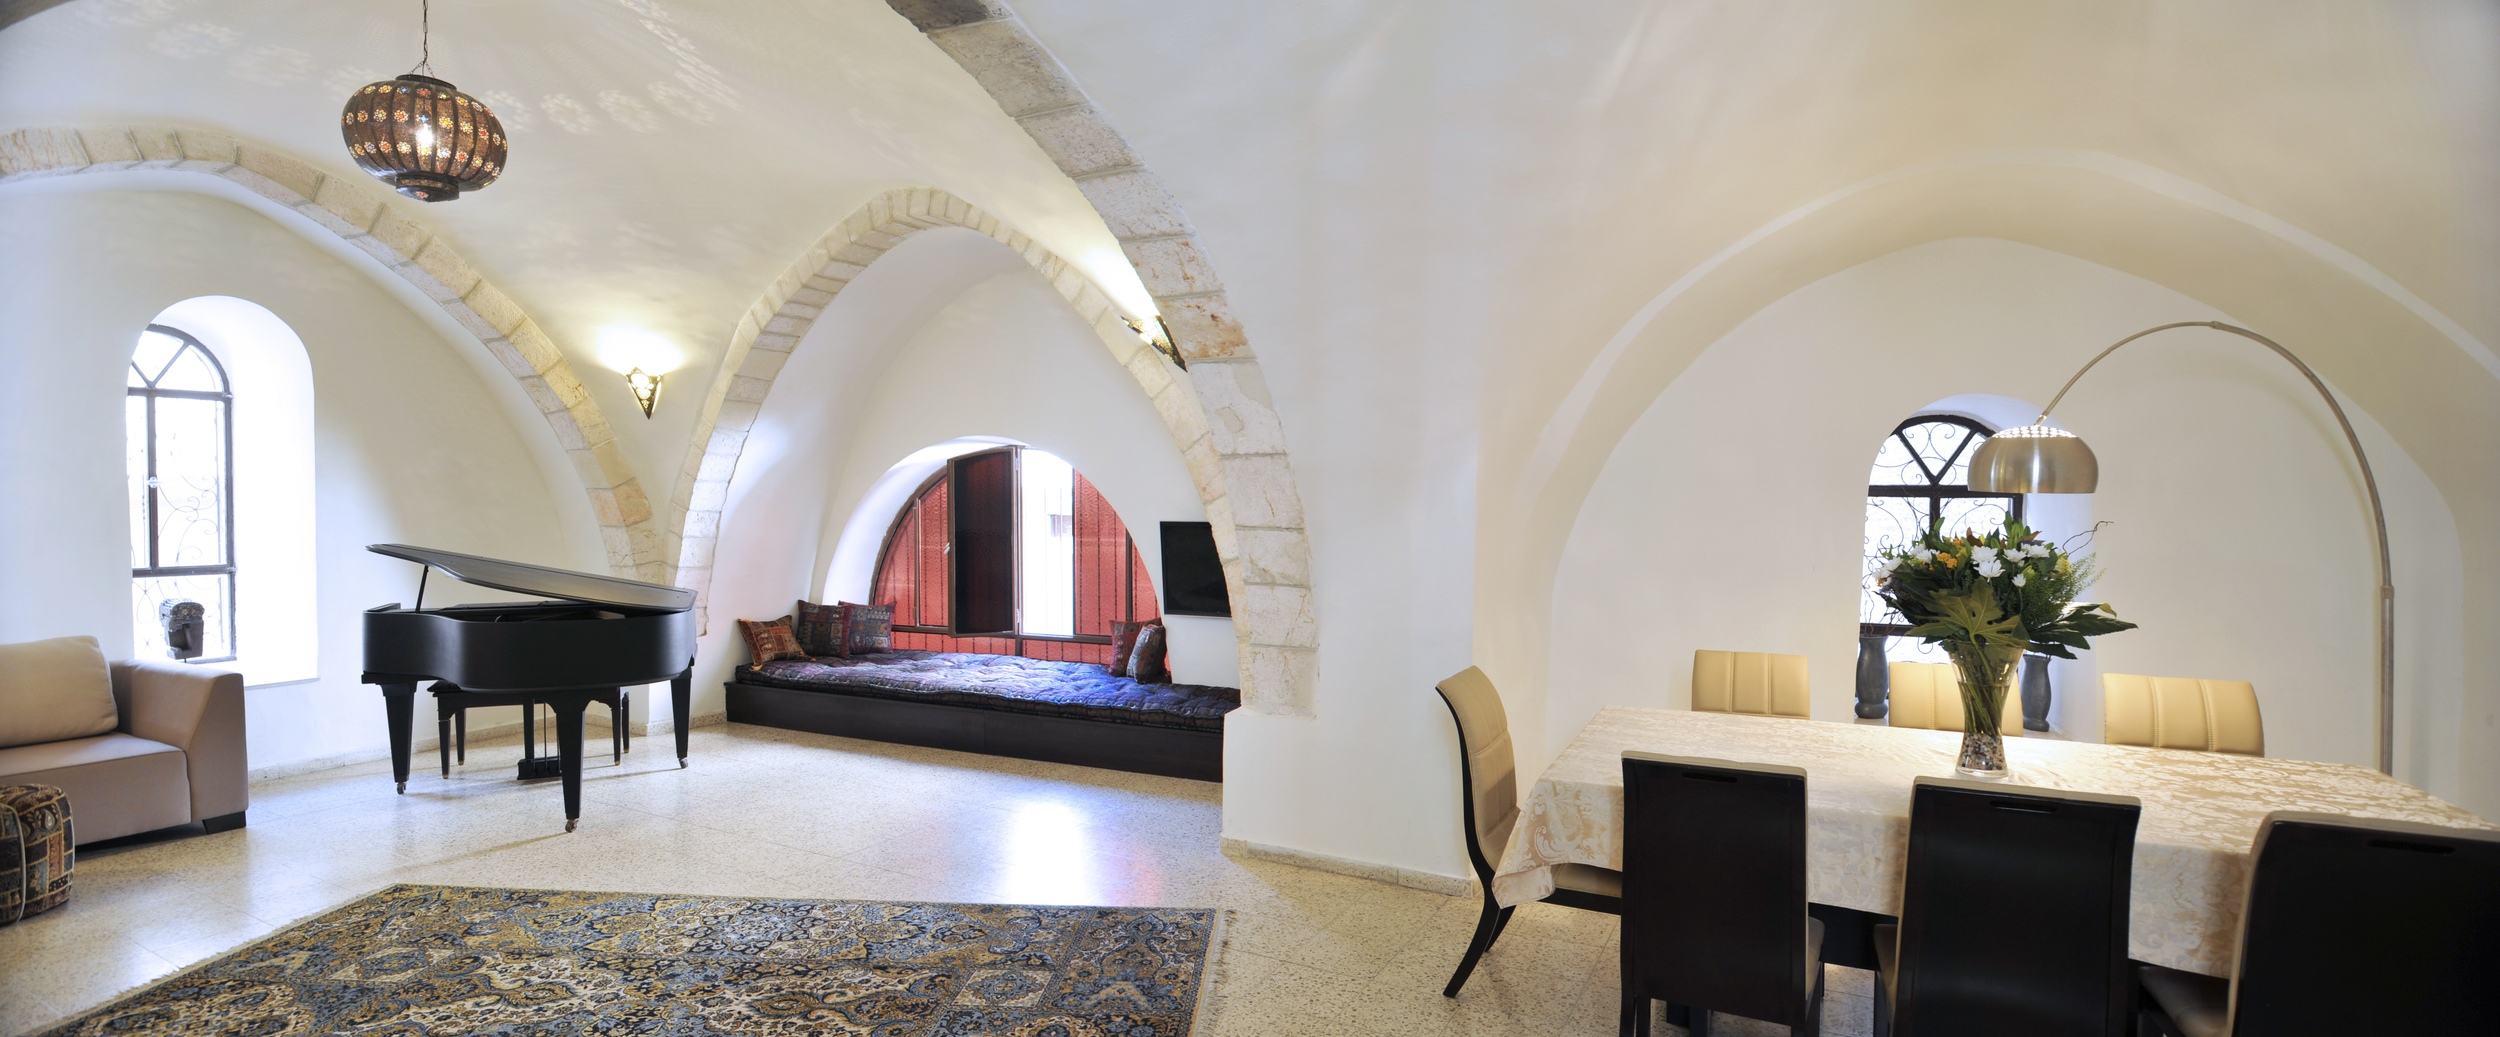 12 - Living Room Panorama.jpg